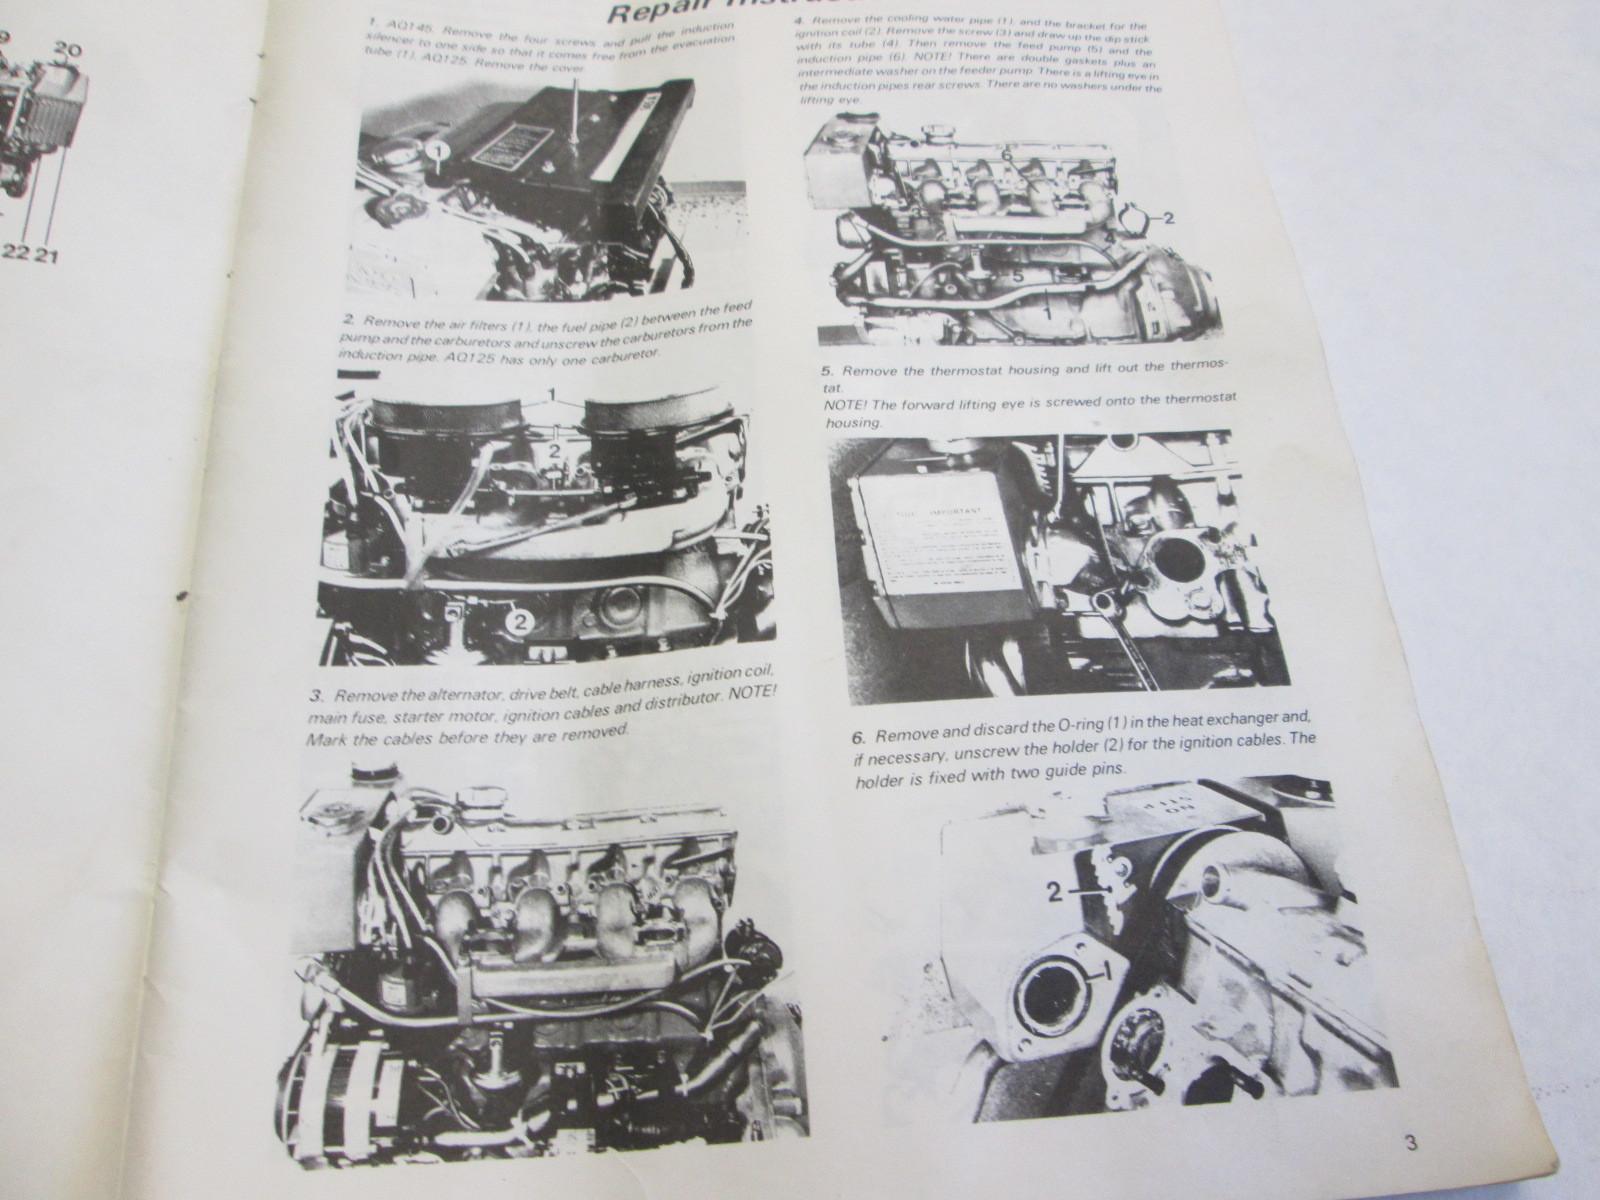 Aq145 Manual Auto Electrical Wiring Diagram 1984 Volvo Penta Aq125a Engine Aq145a Stern Drive Workshop